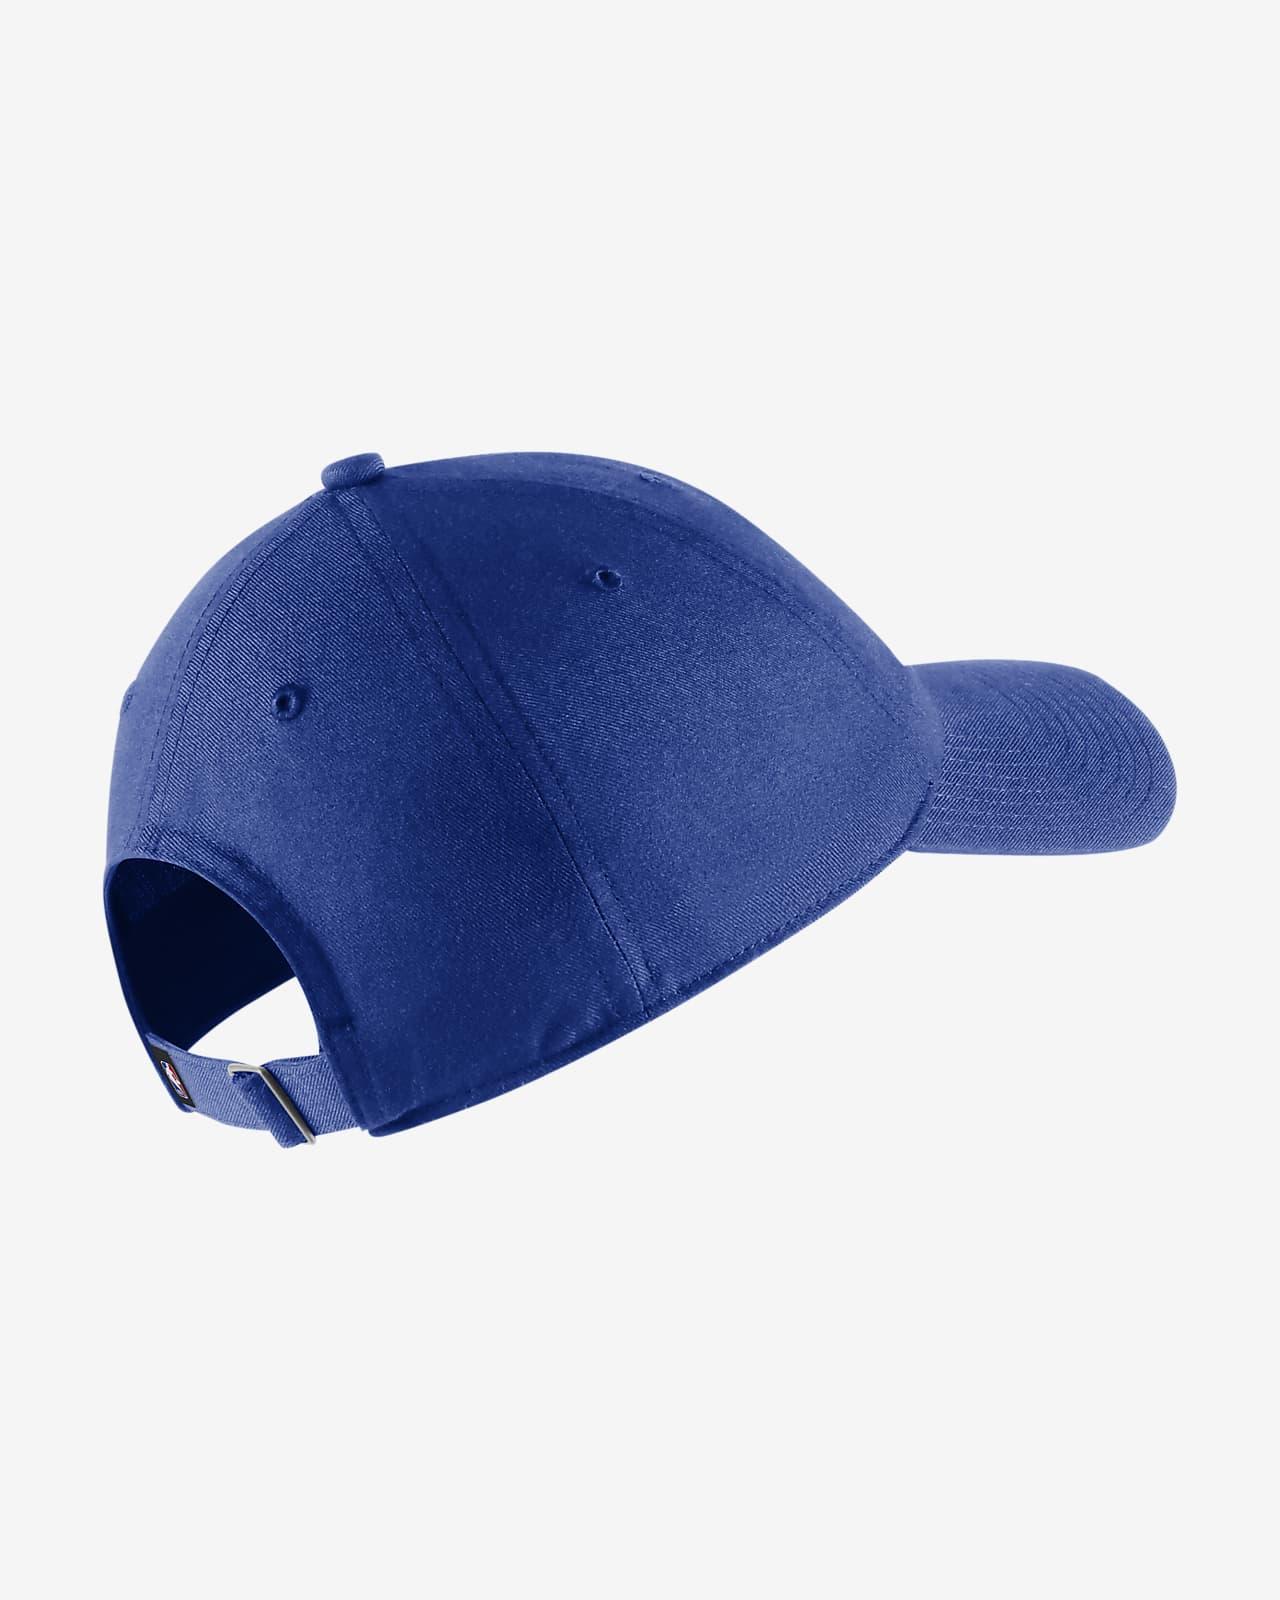 Golden State Warriors Heritage86 Nike NBA Hat